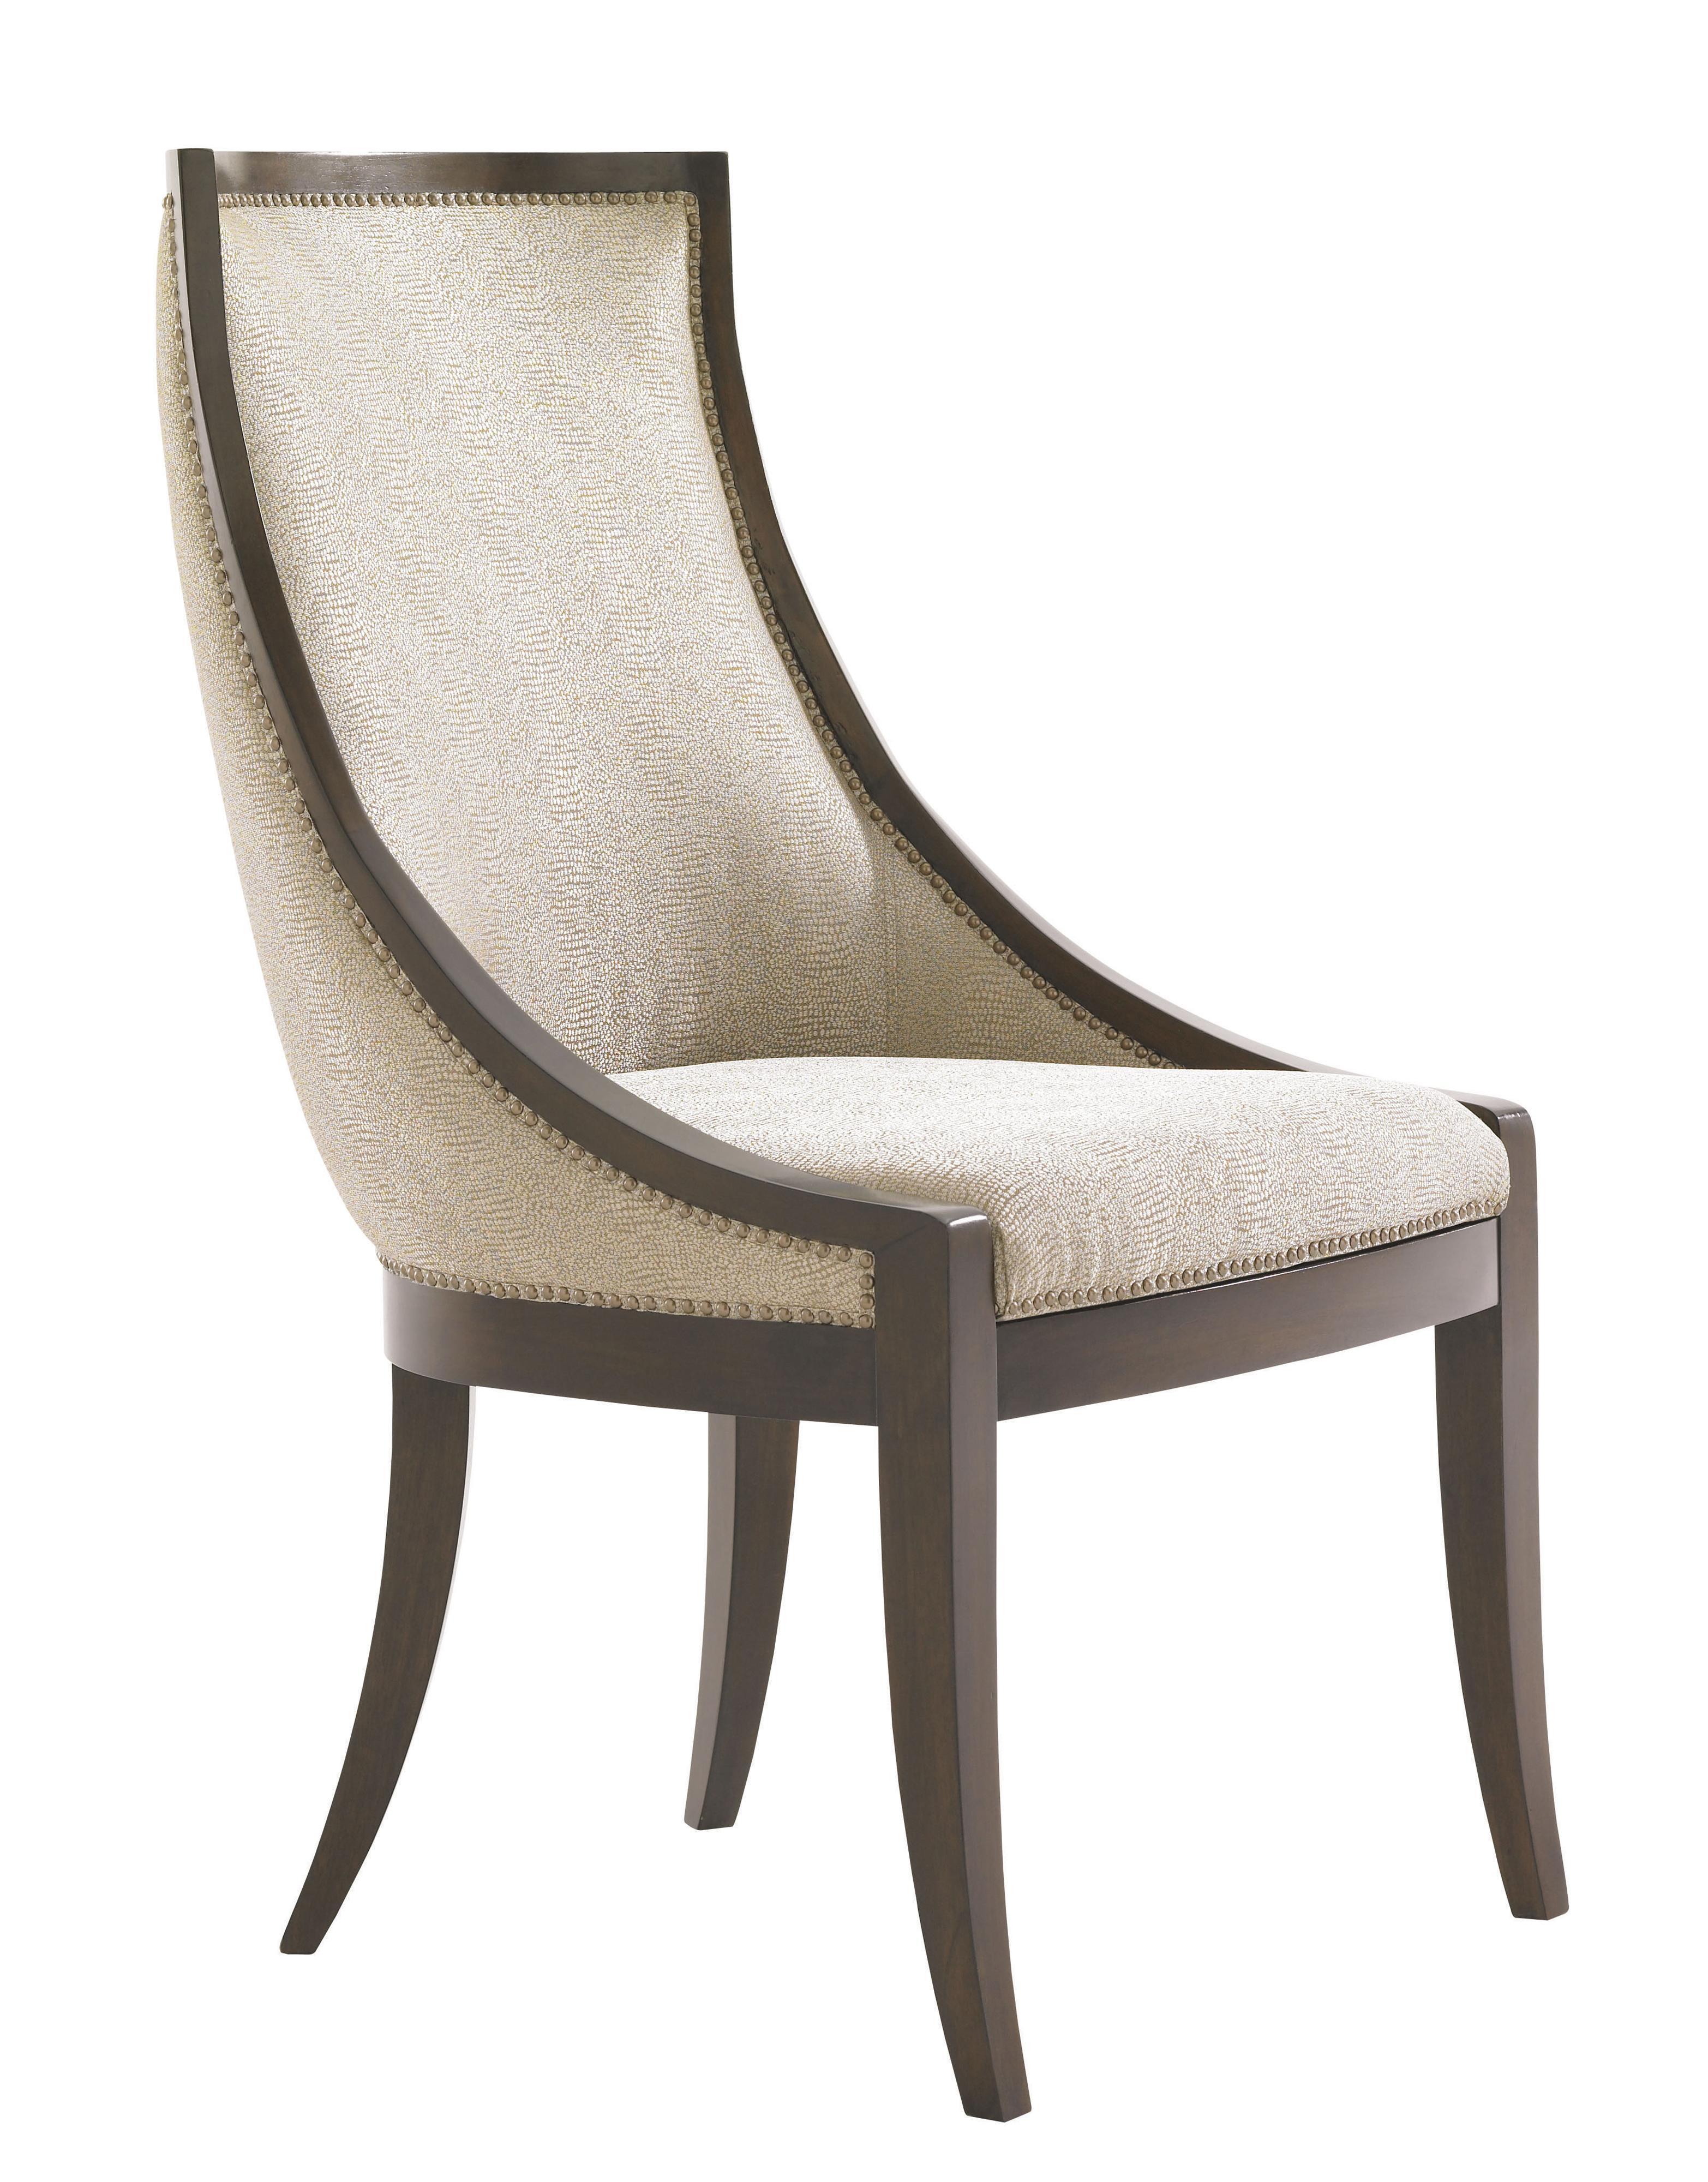 Lexington Tower Place Talbot Quickship Host Chair - Item Number: 706-884-01